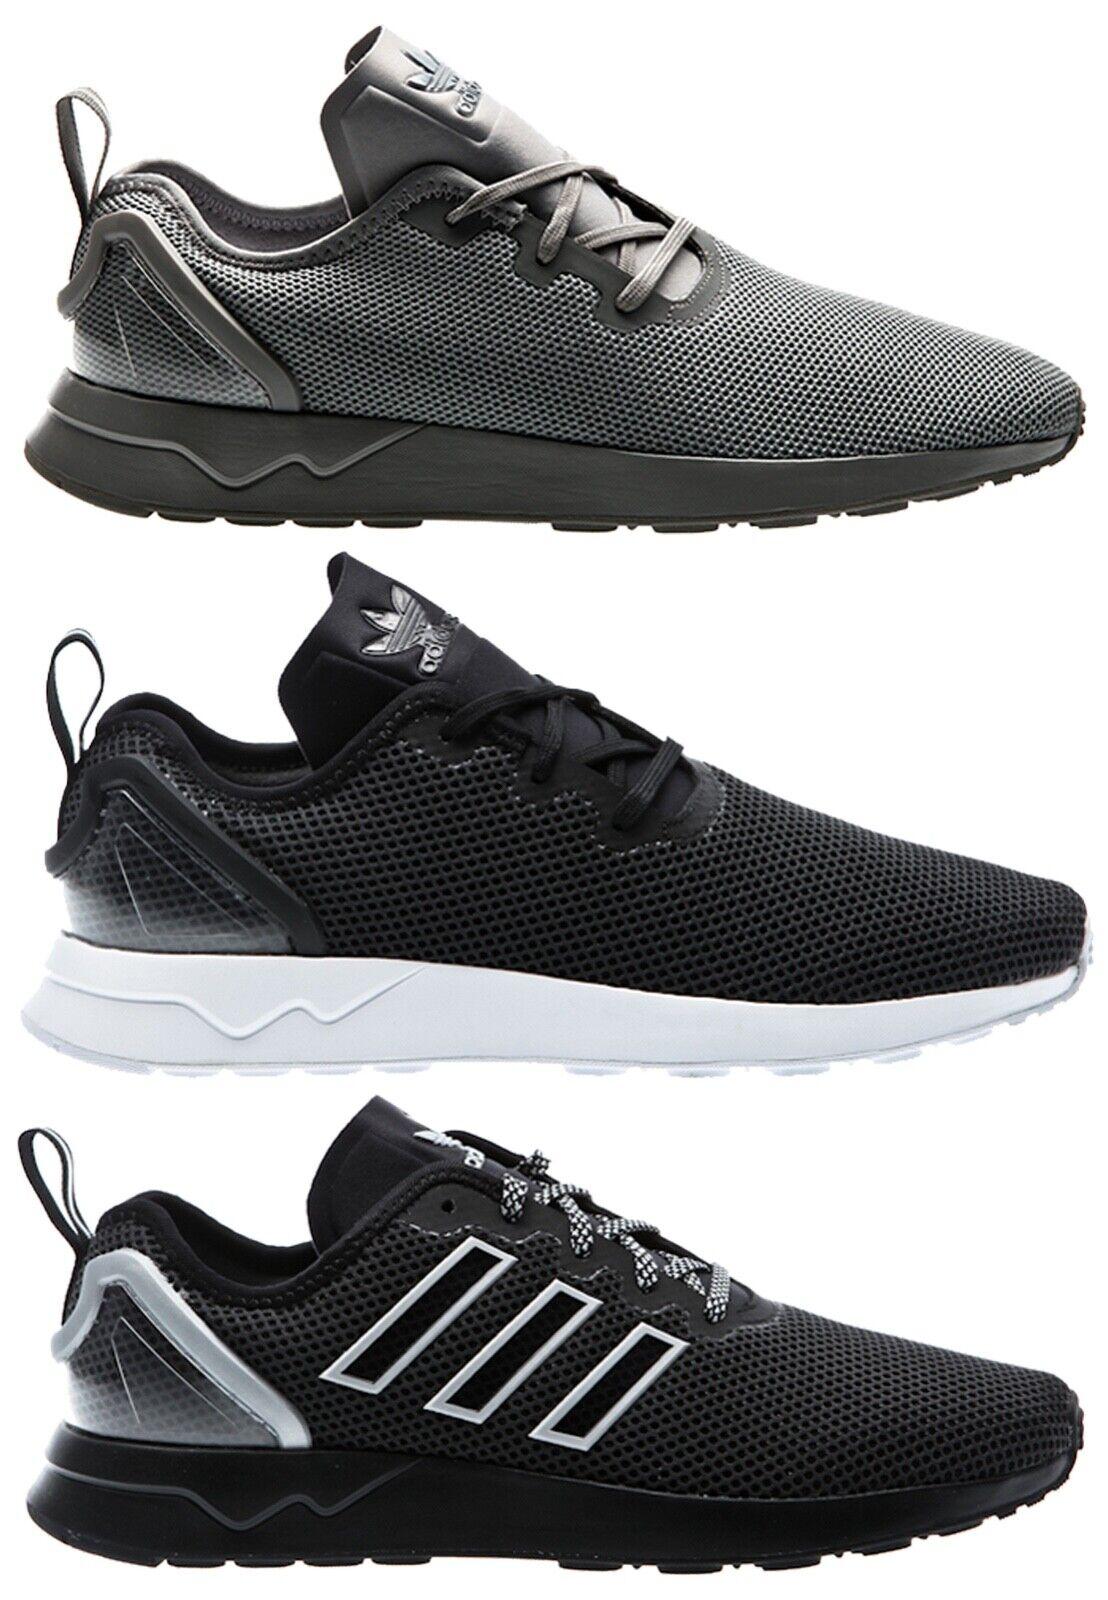 official photos 59887 96e9d Adidas Zx Flux Racer Adv Asymmetrical Men Sneaker Mens Shoes Runnings Shoes